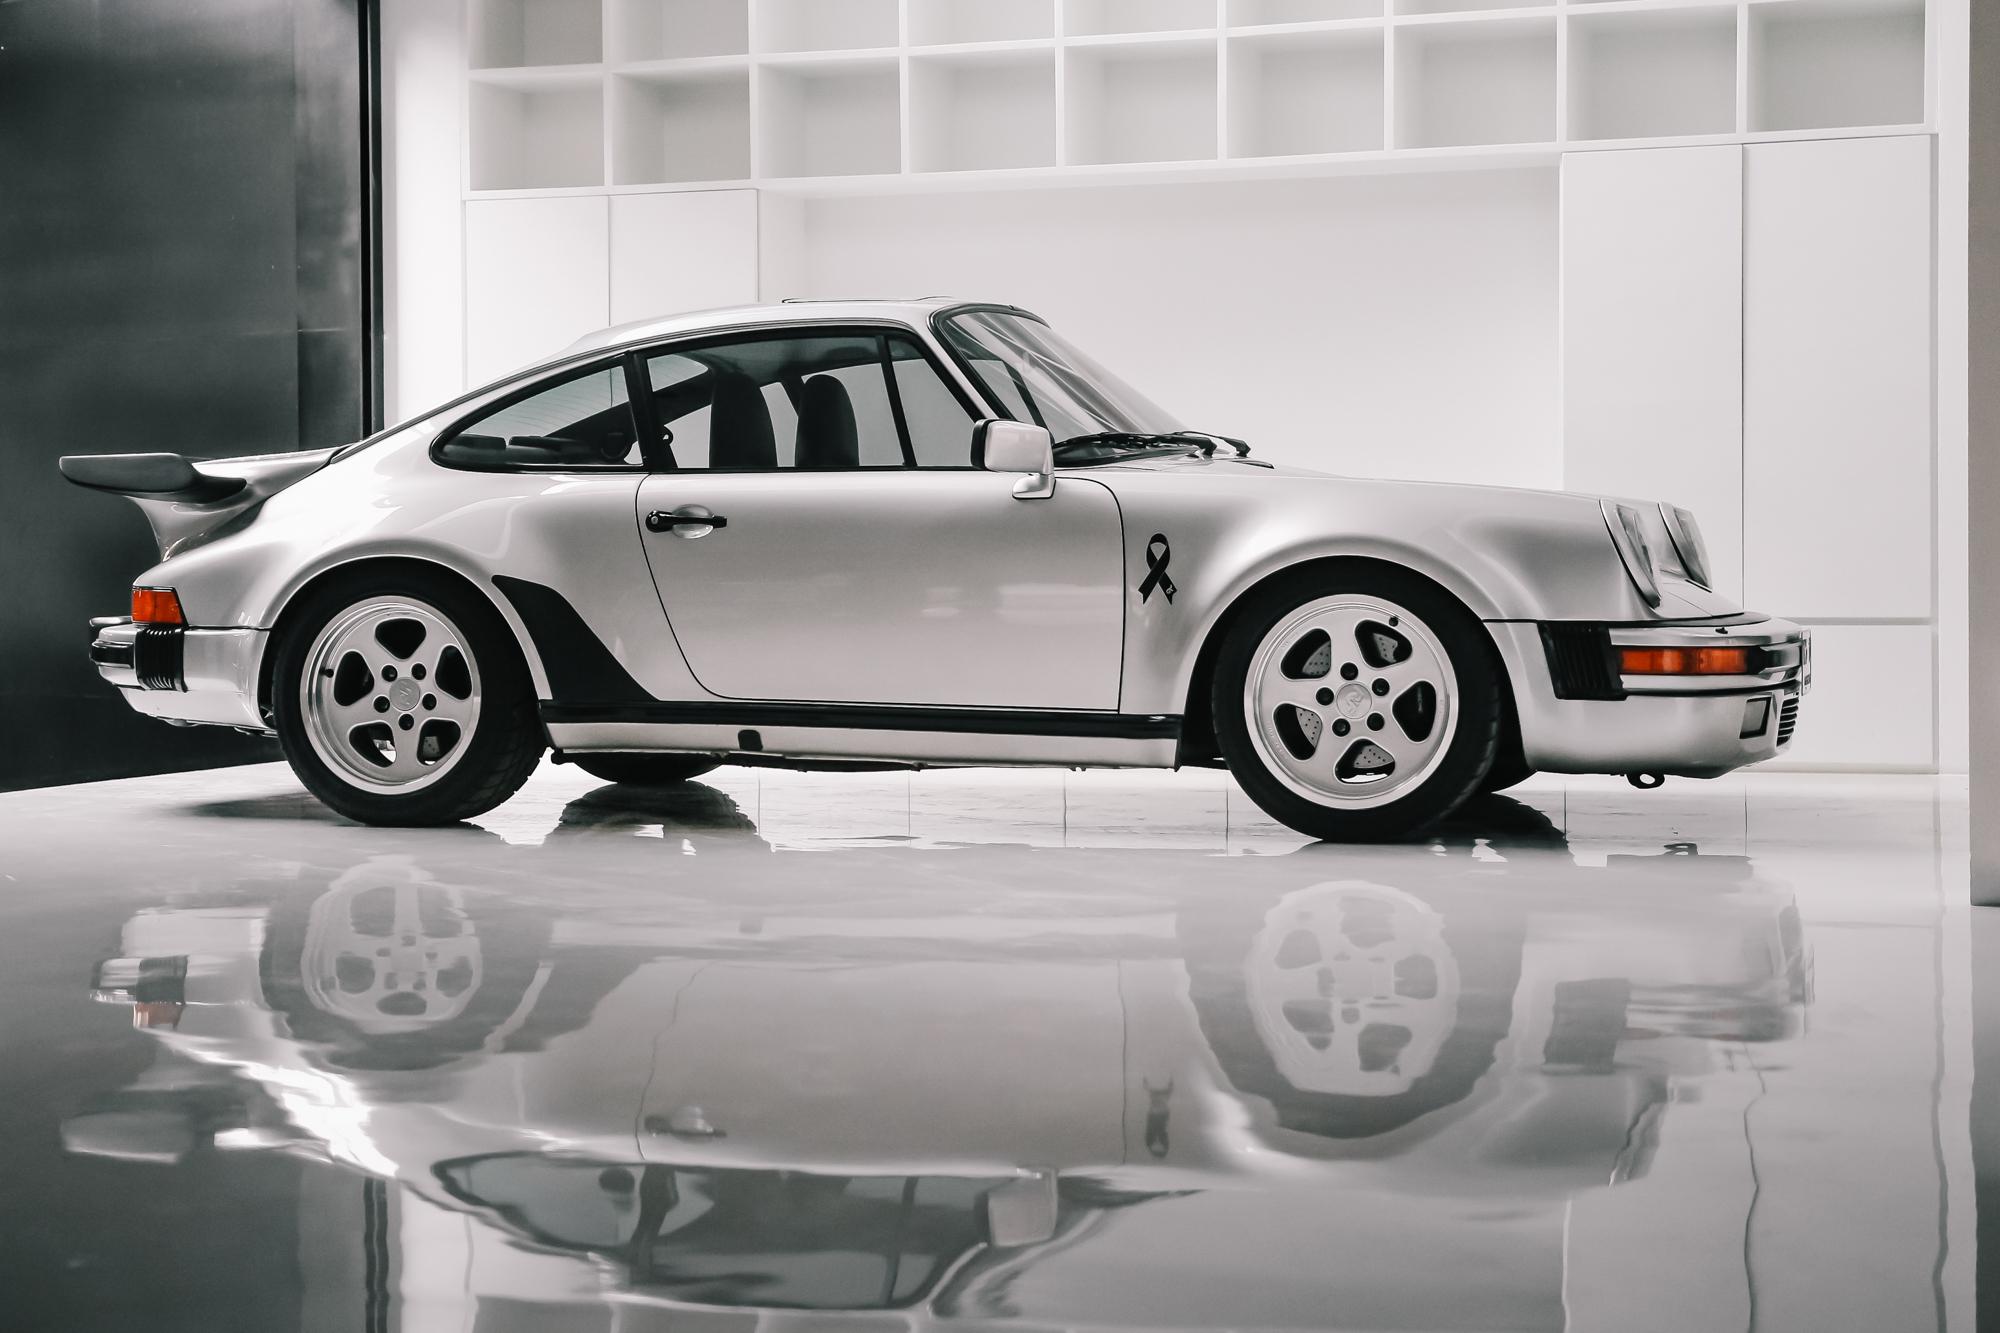 TeensterPorscheHouse249-1 Cozy Prix D'une Porsche 911 Gt1 Cars Trend